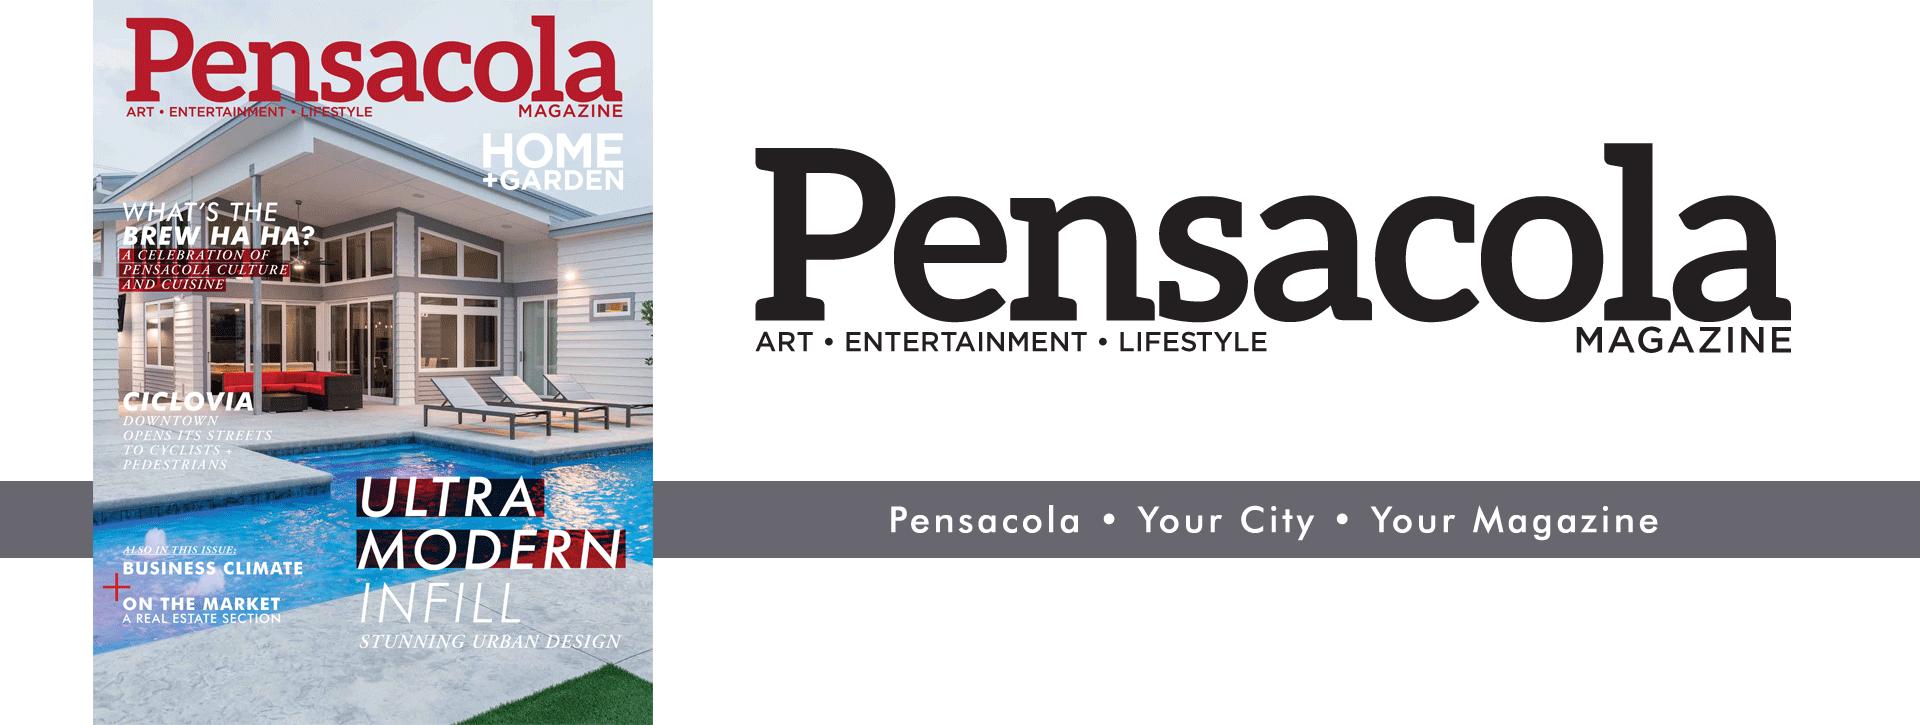 Pensacola Magazine, March 2018